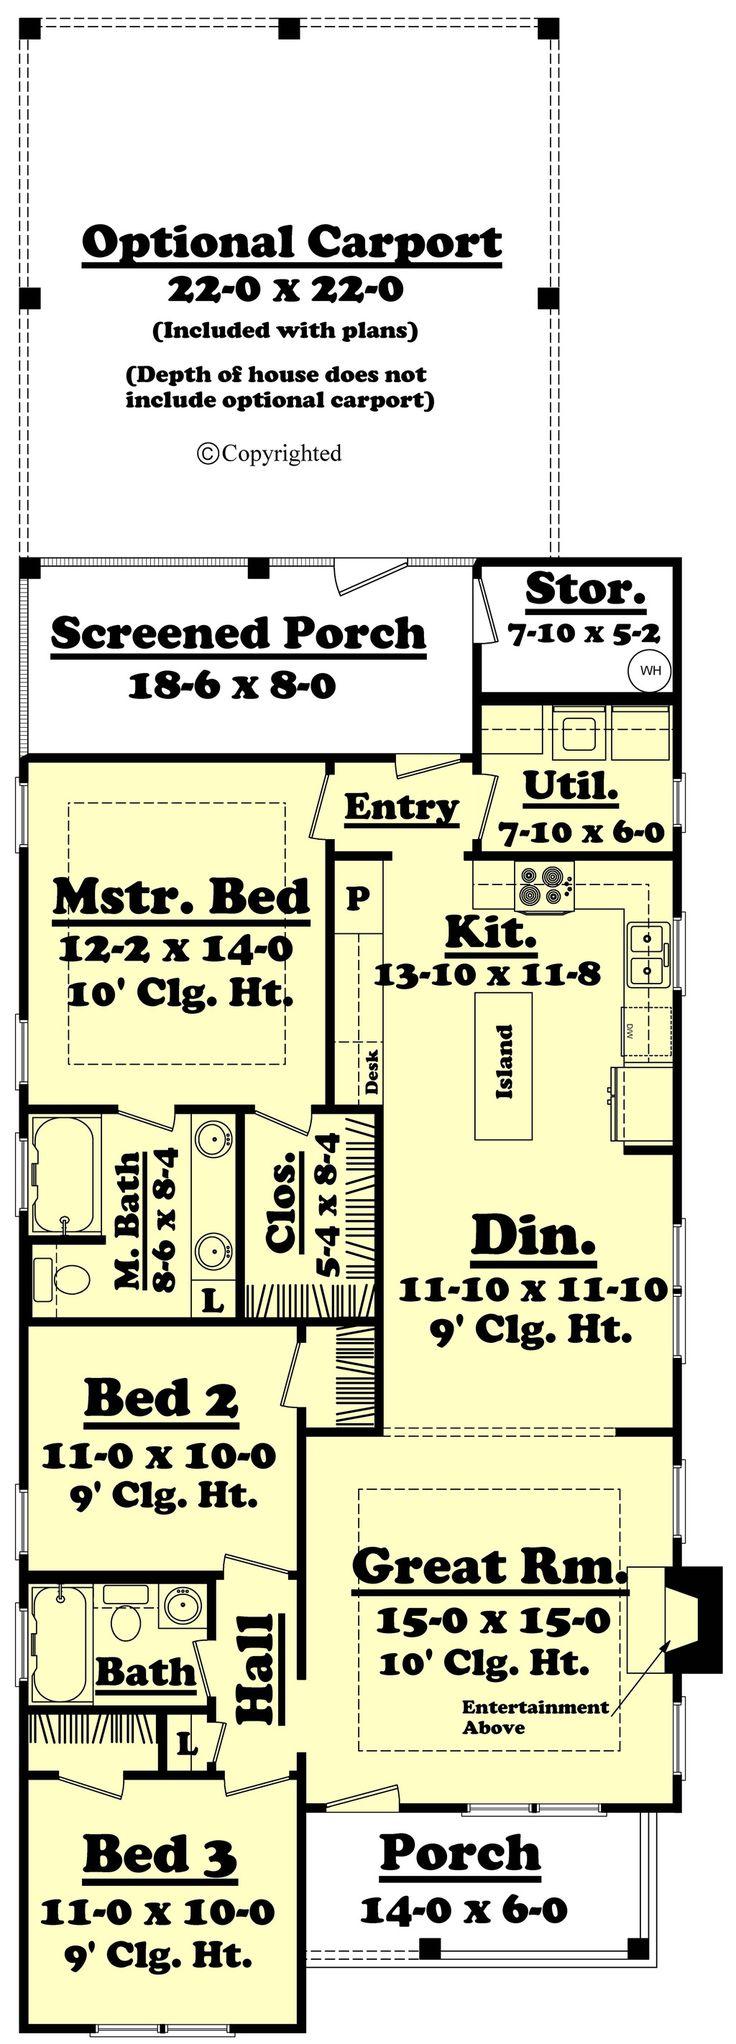 Cottage Style House Plan - 3 Beds 2 Baths 1300 Sq/Ft Plan #430-40 Floor Plan - Main Floor Plan - Houseplans.com